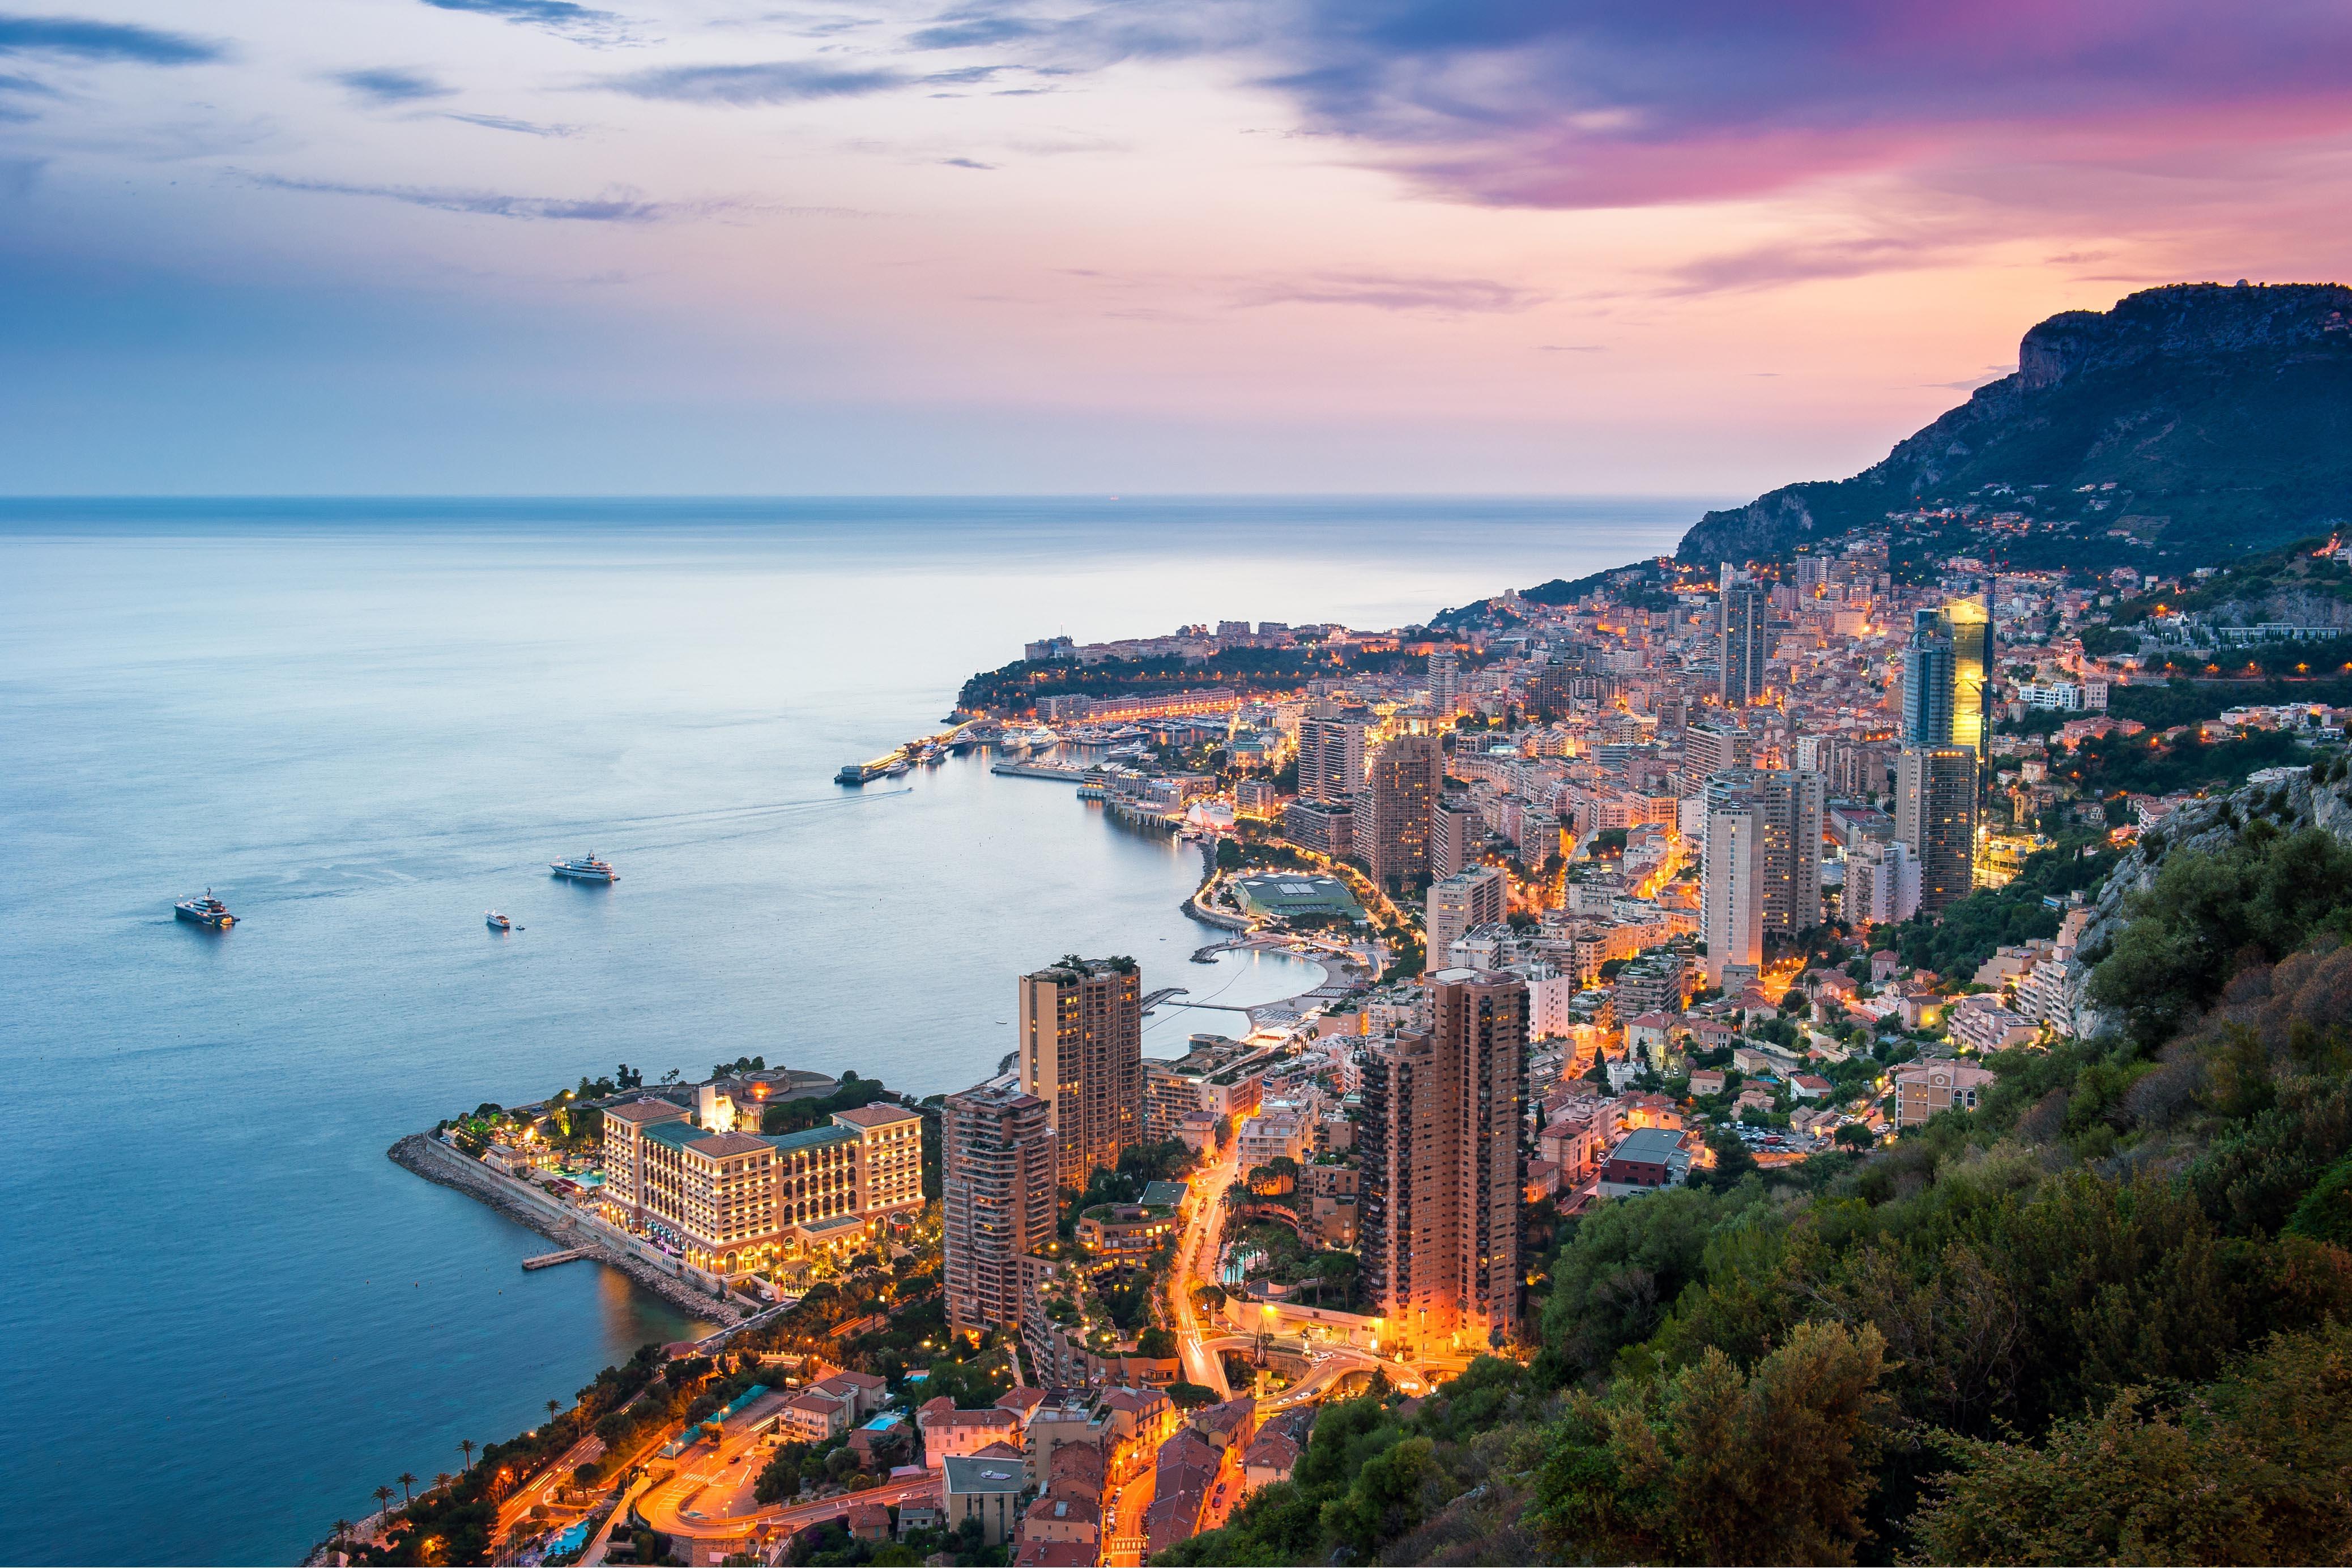 Лучшие маршруты по Европе вместе с брендом Celebrity Cruises